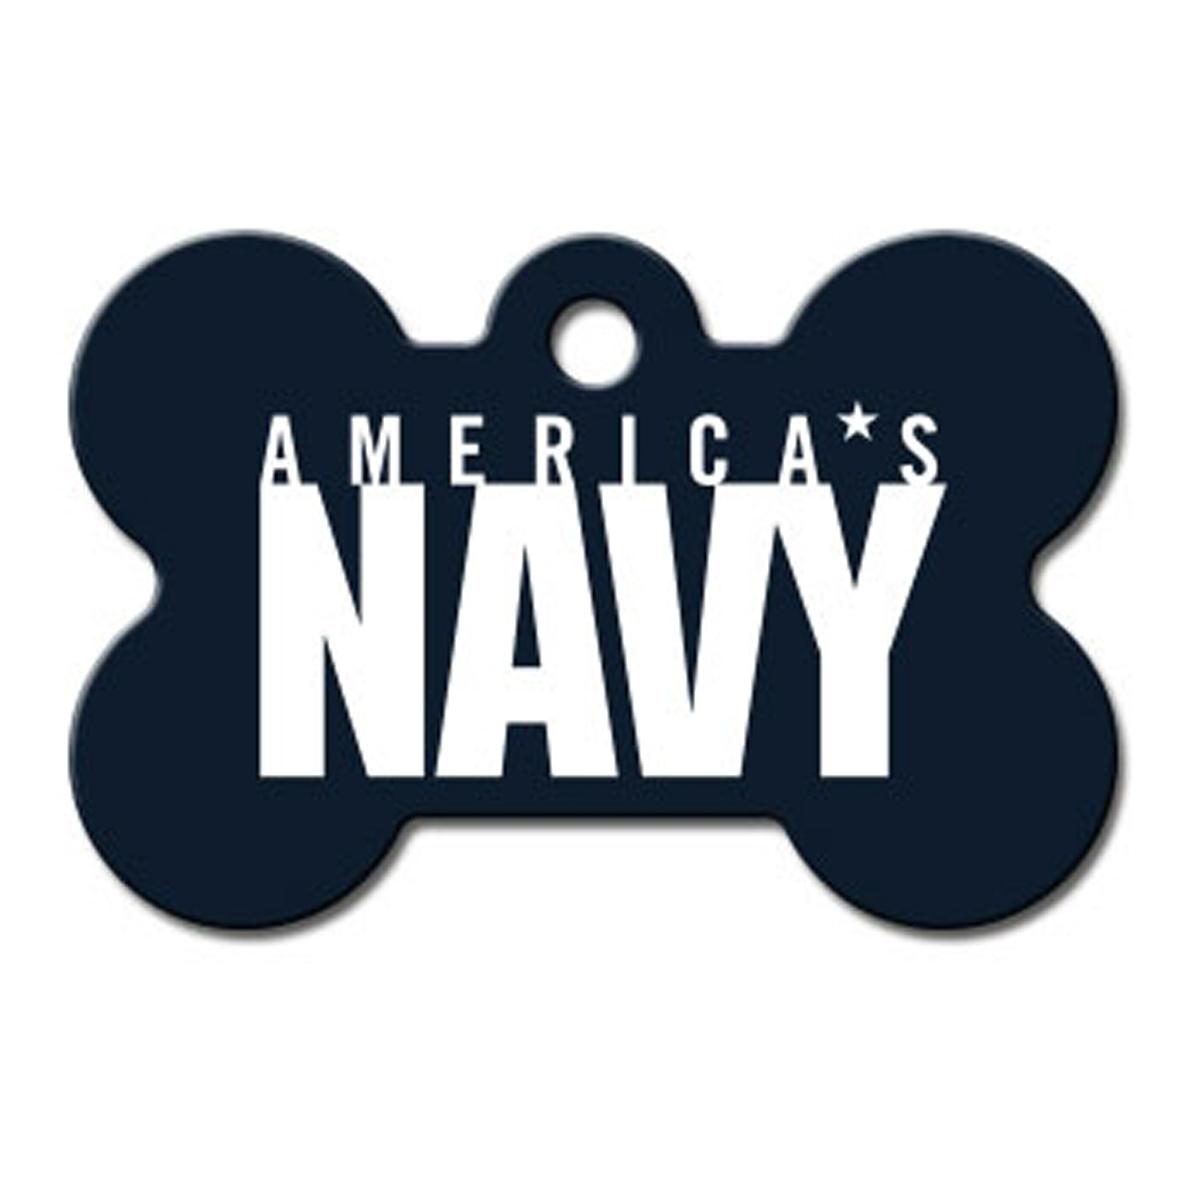 U.S. Navy Engravable Pet I.D. Tag - Large Bone